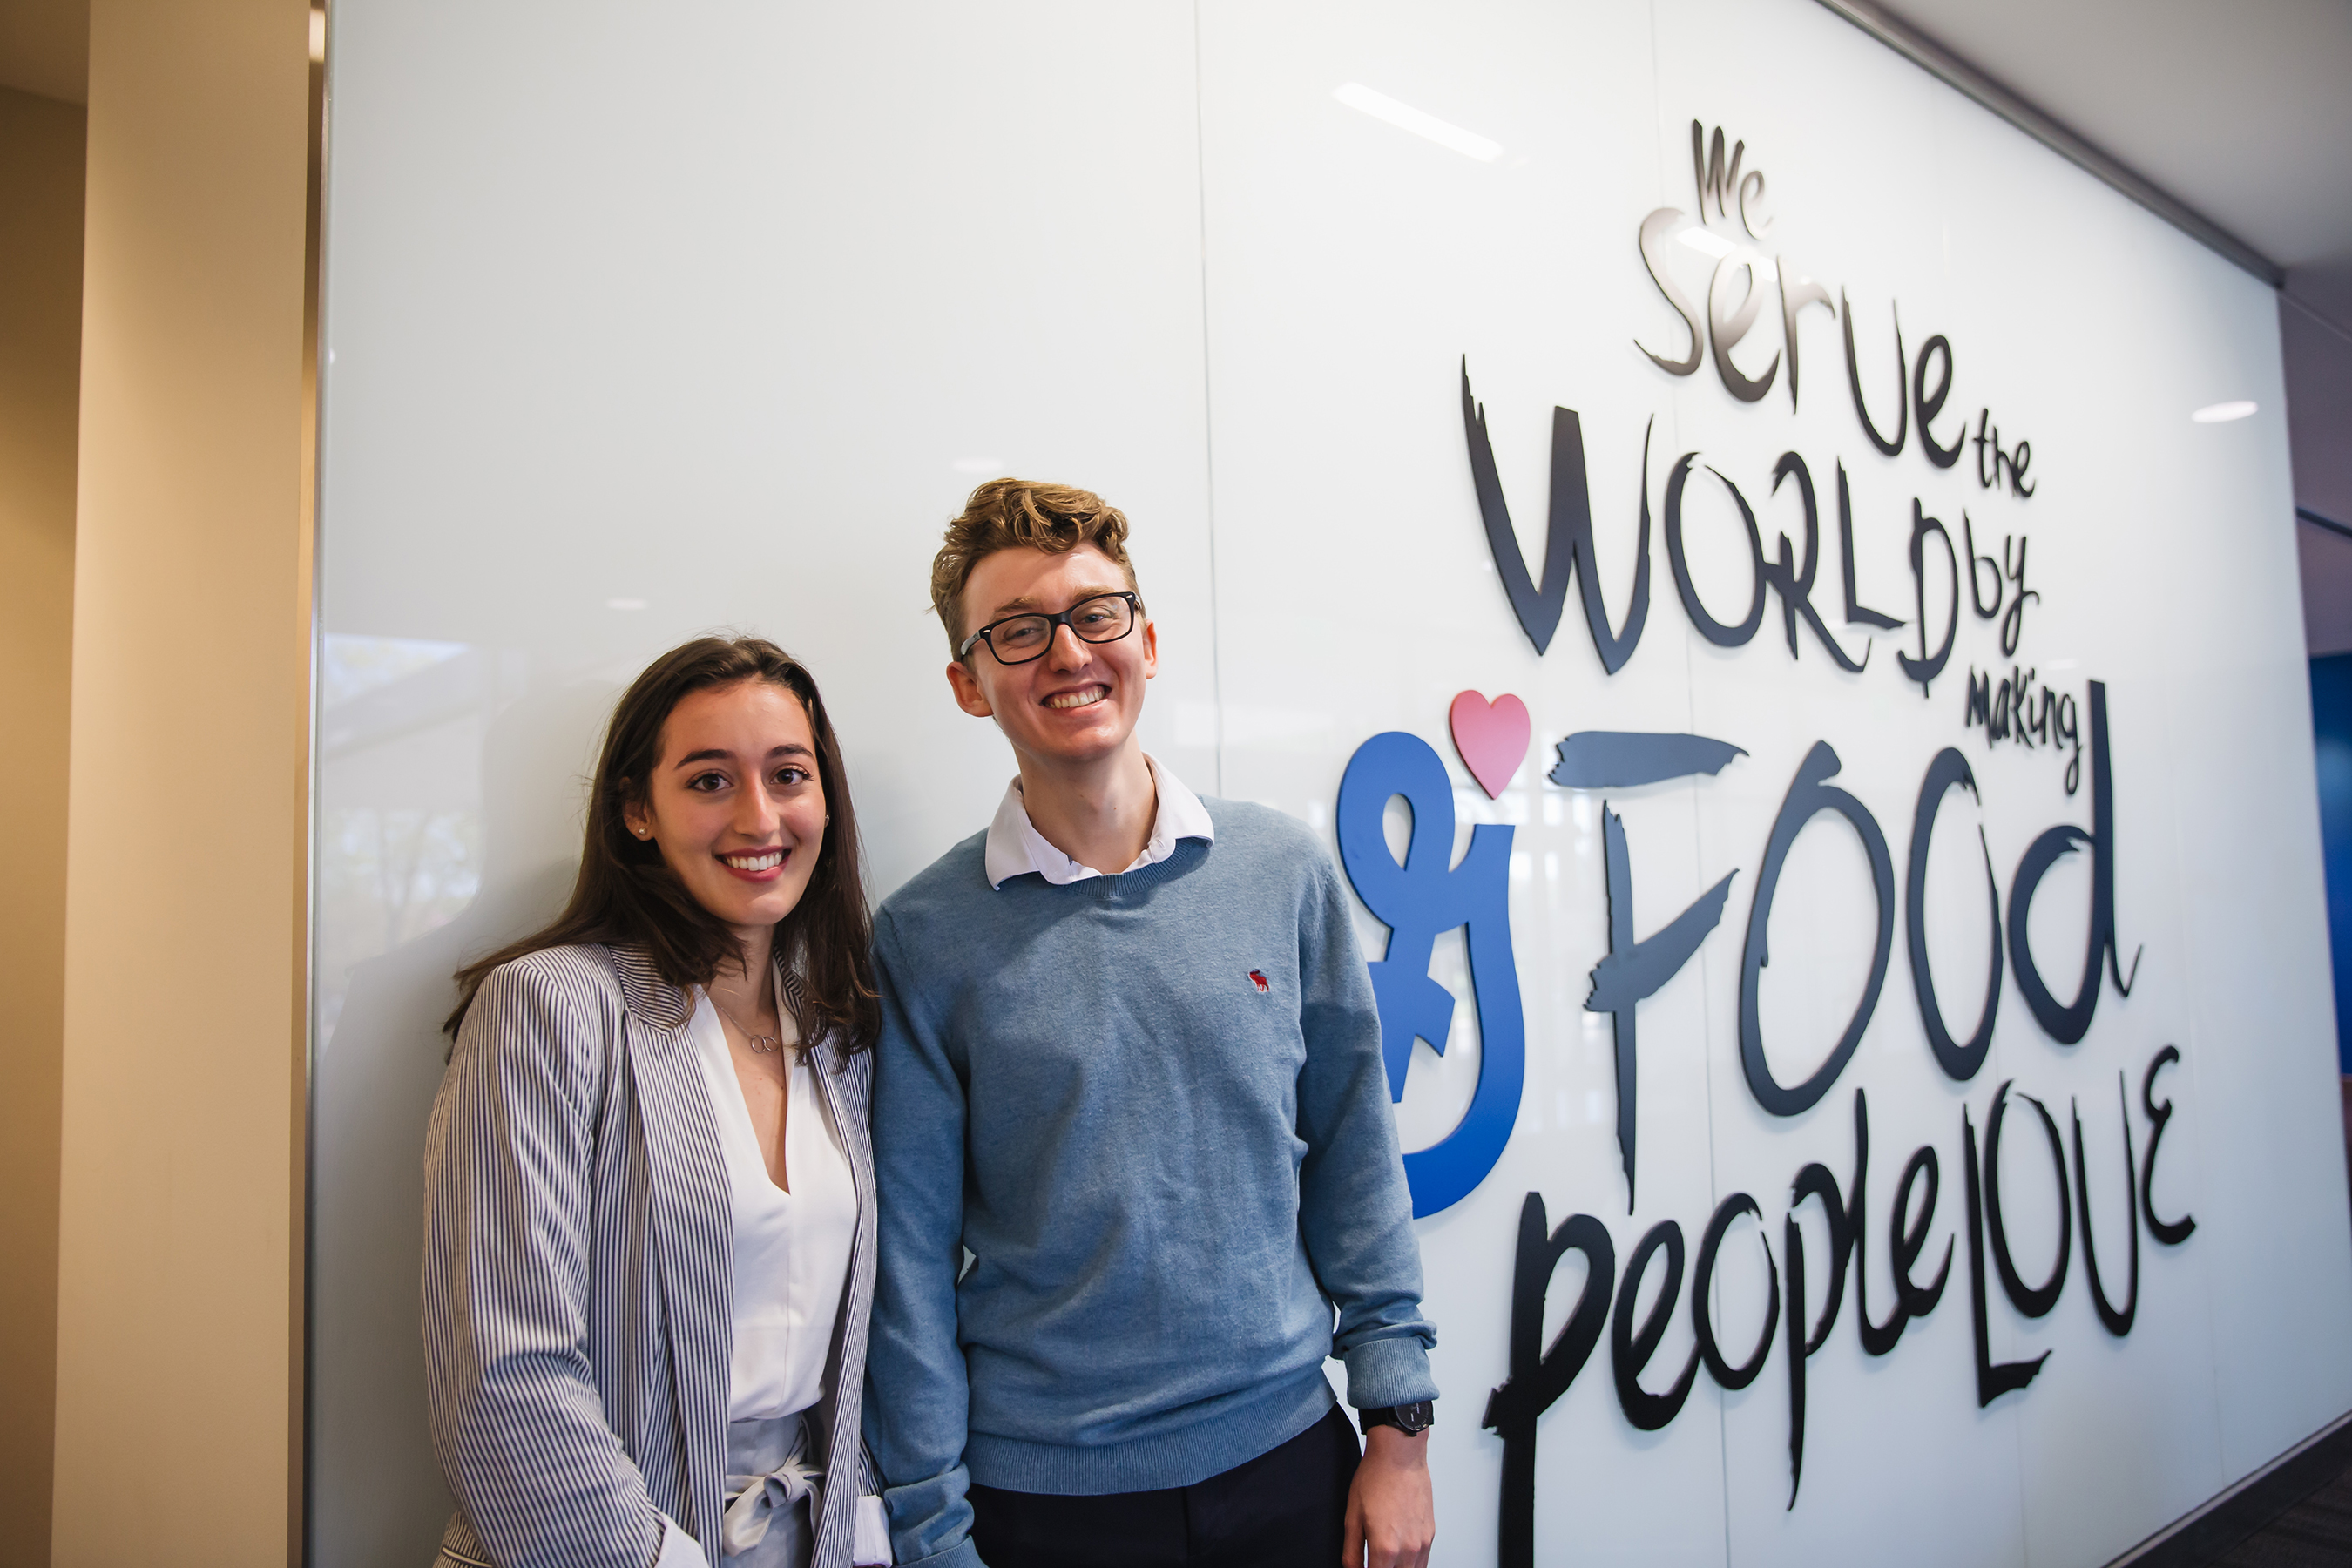 General Mills Feeding Better Futures Scholars Program winners Emma and Ugo Angeletti, founders of back2earth